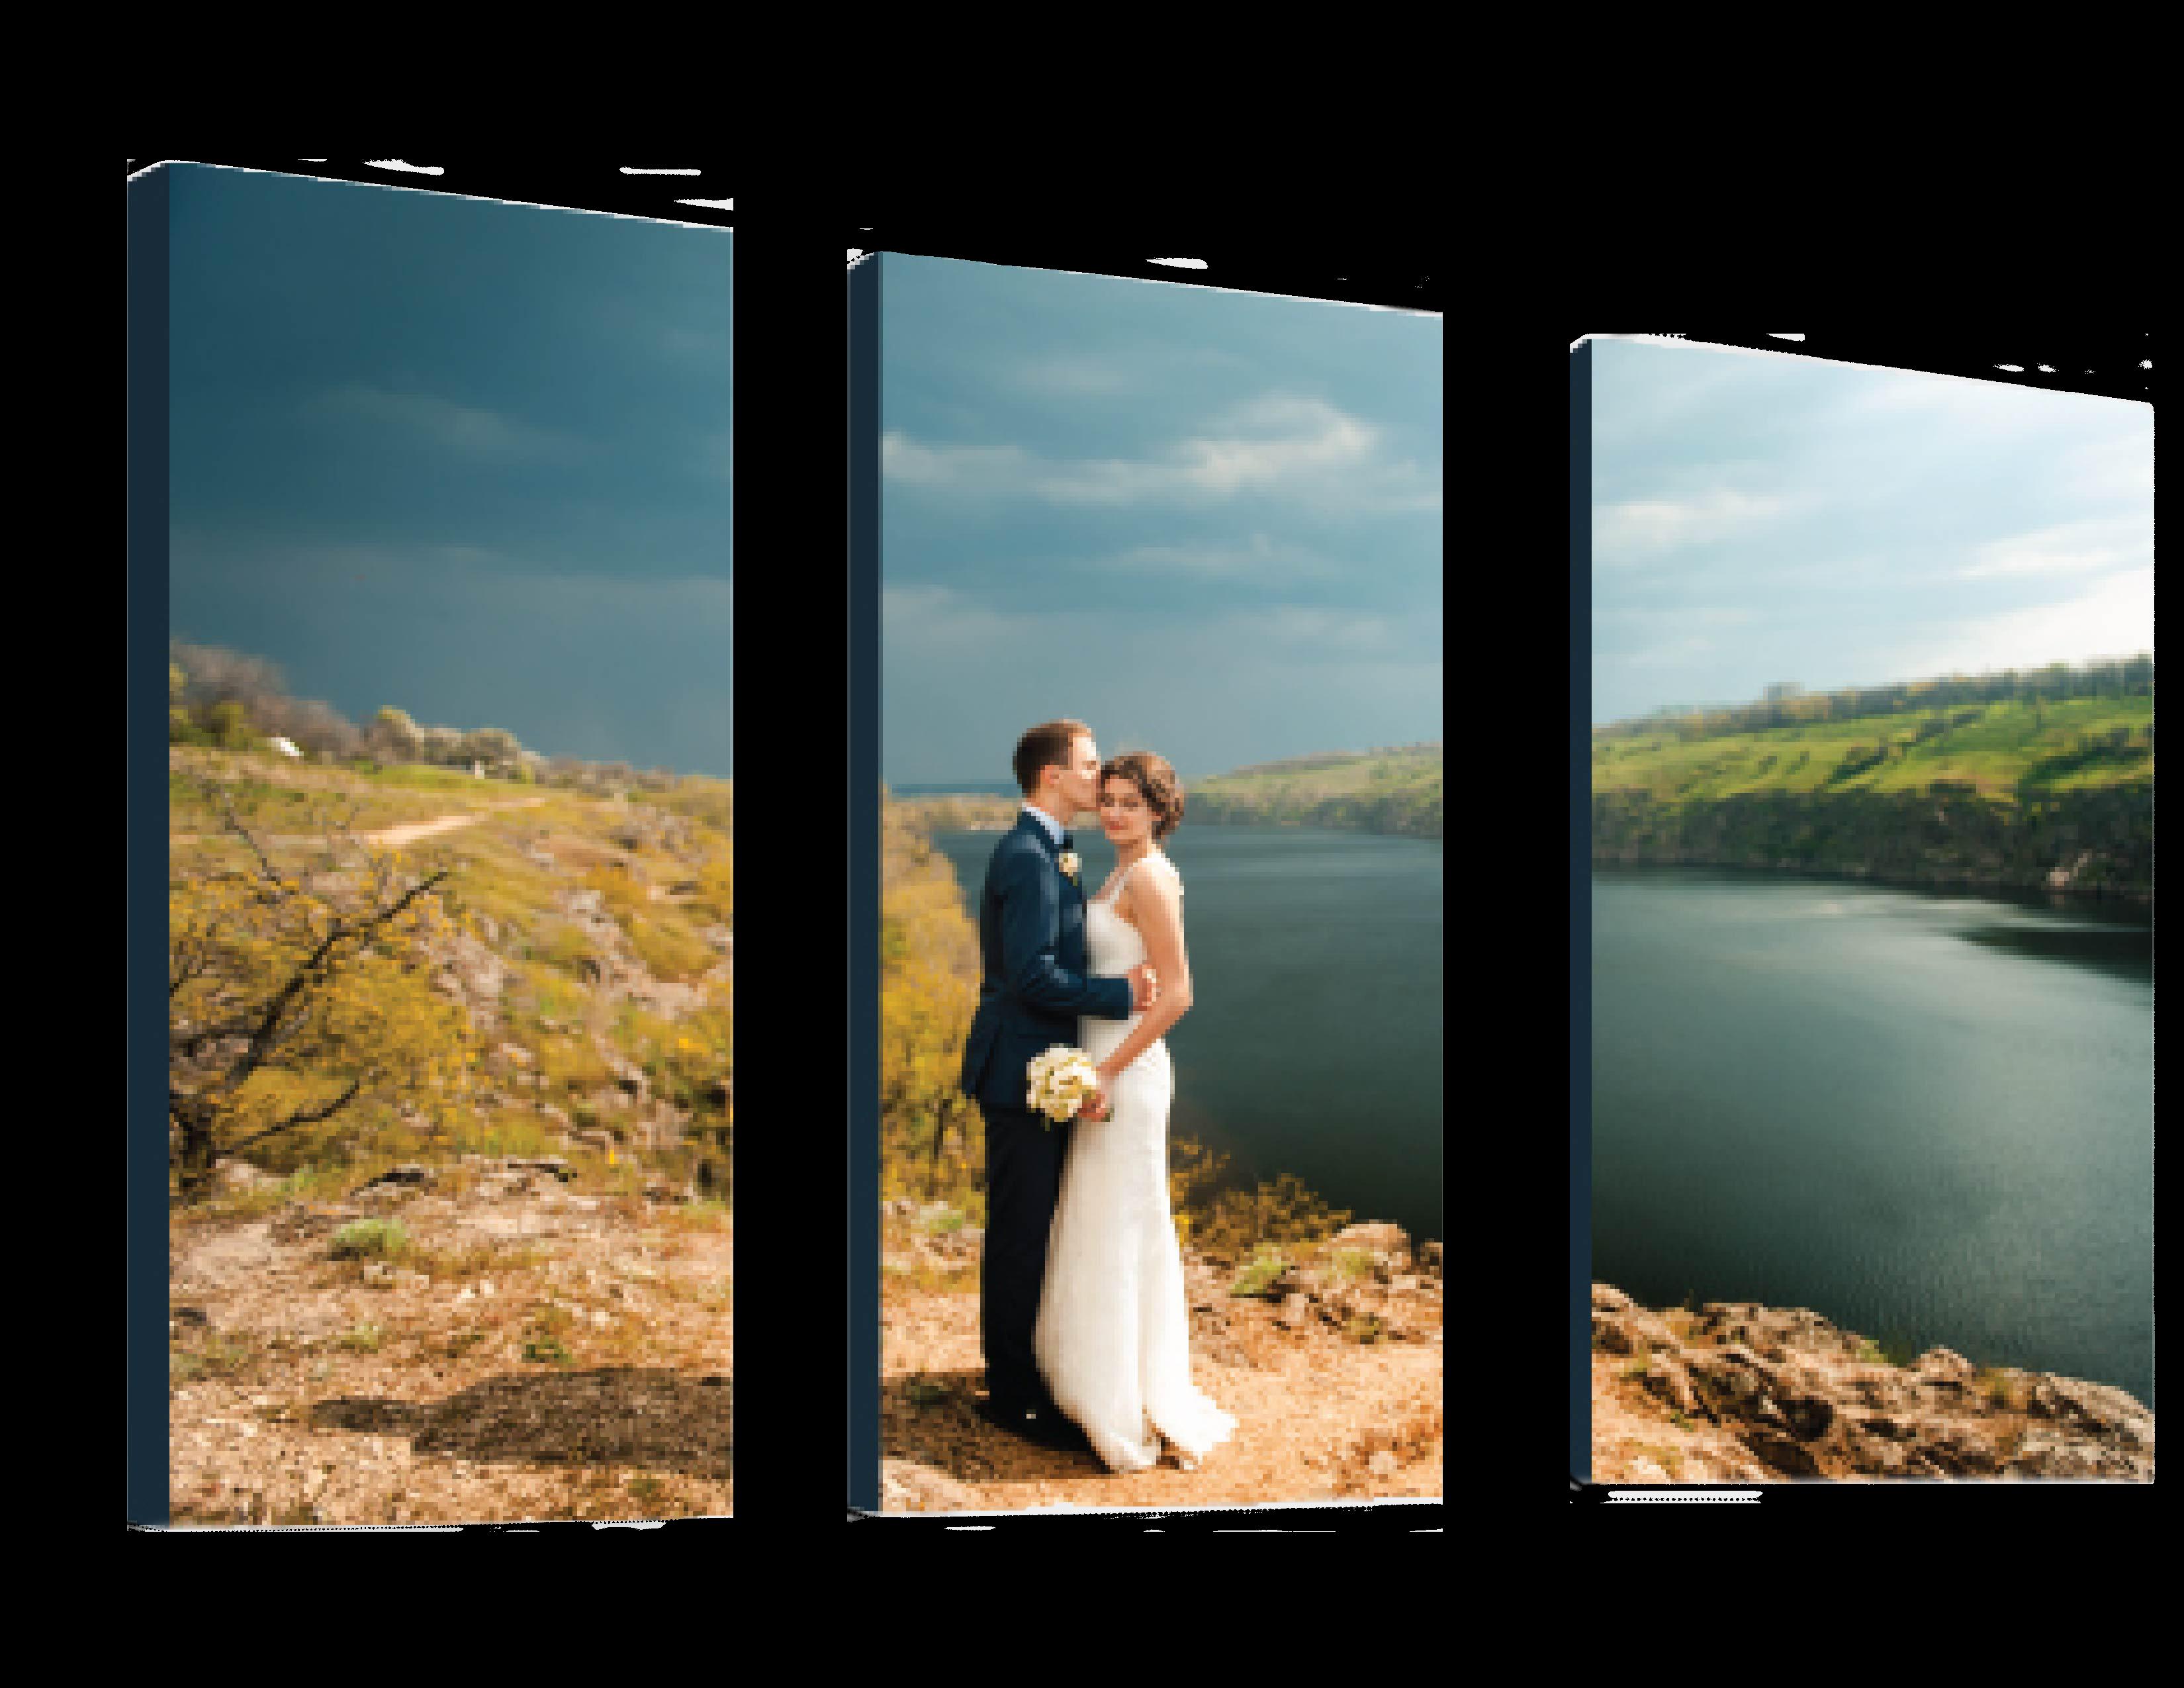 Thumbnail of Wedding Portrait River Landscape Printed                 on Split Image Canvas Gallery Wraps